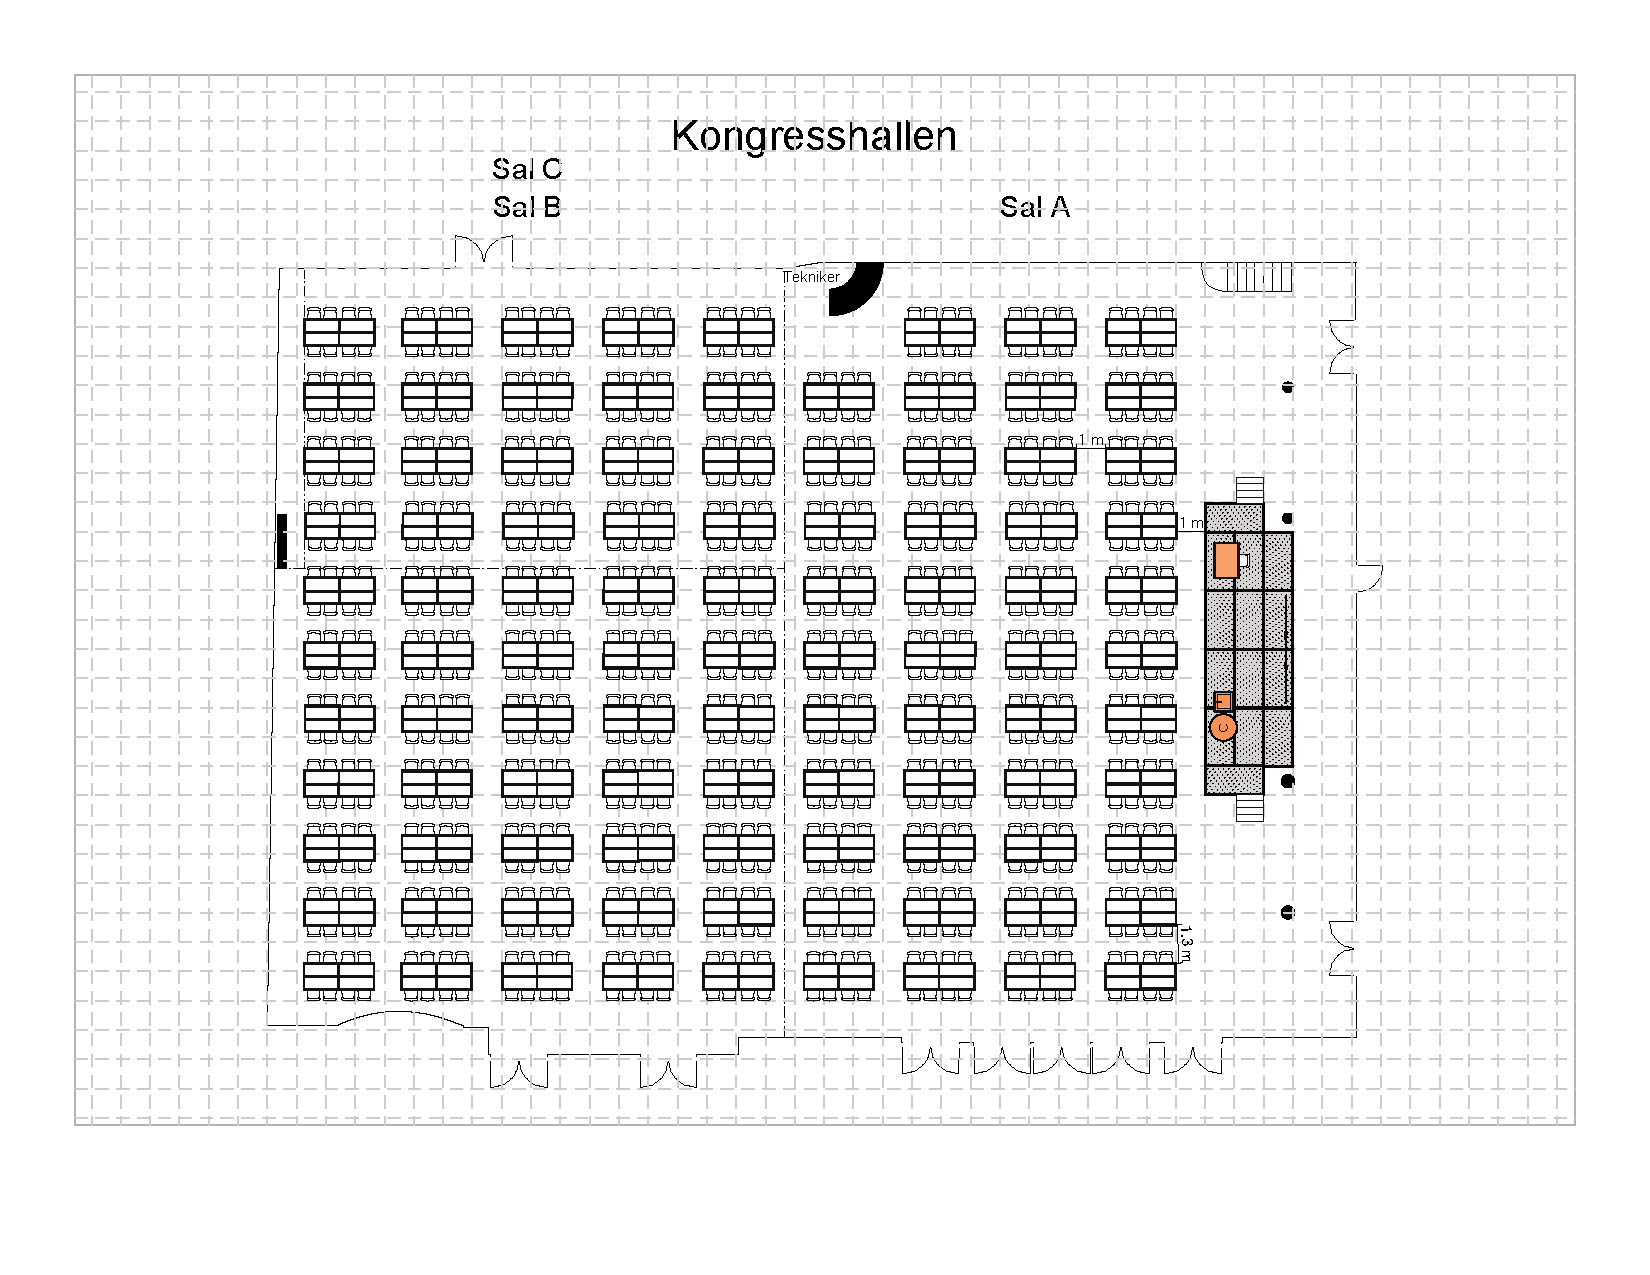 Gruppebord à 8, 784 plasser